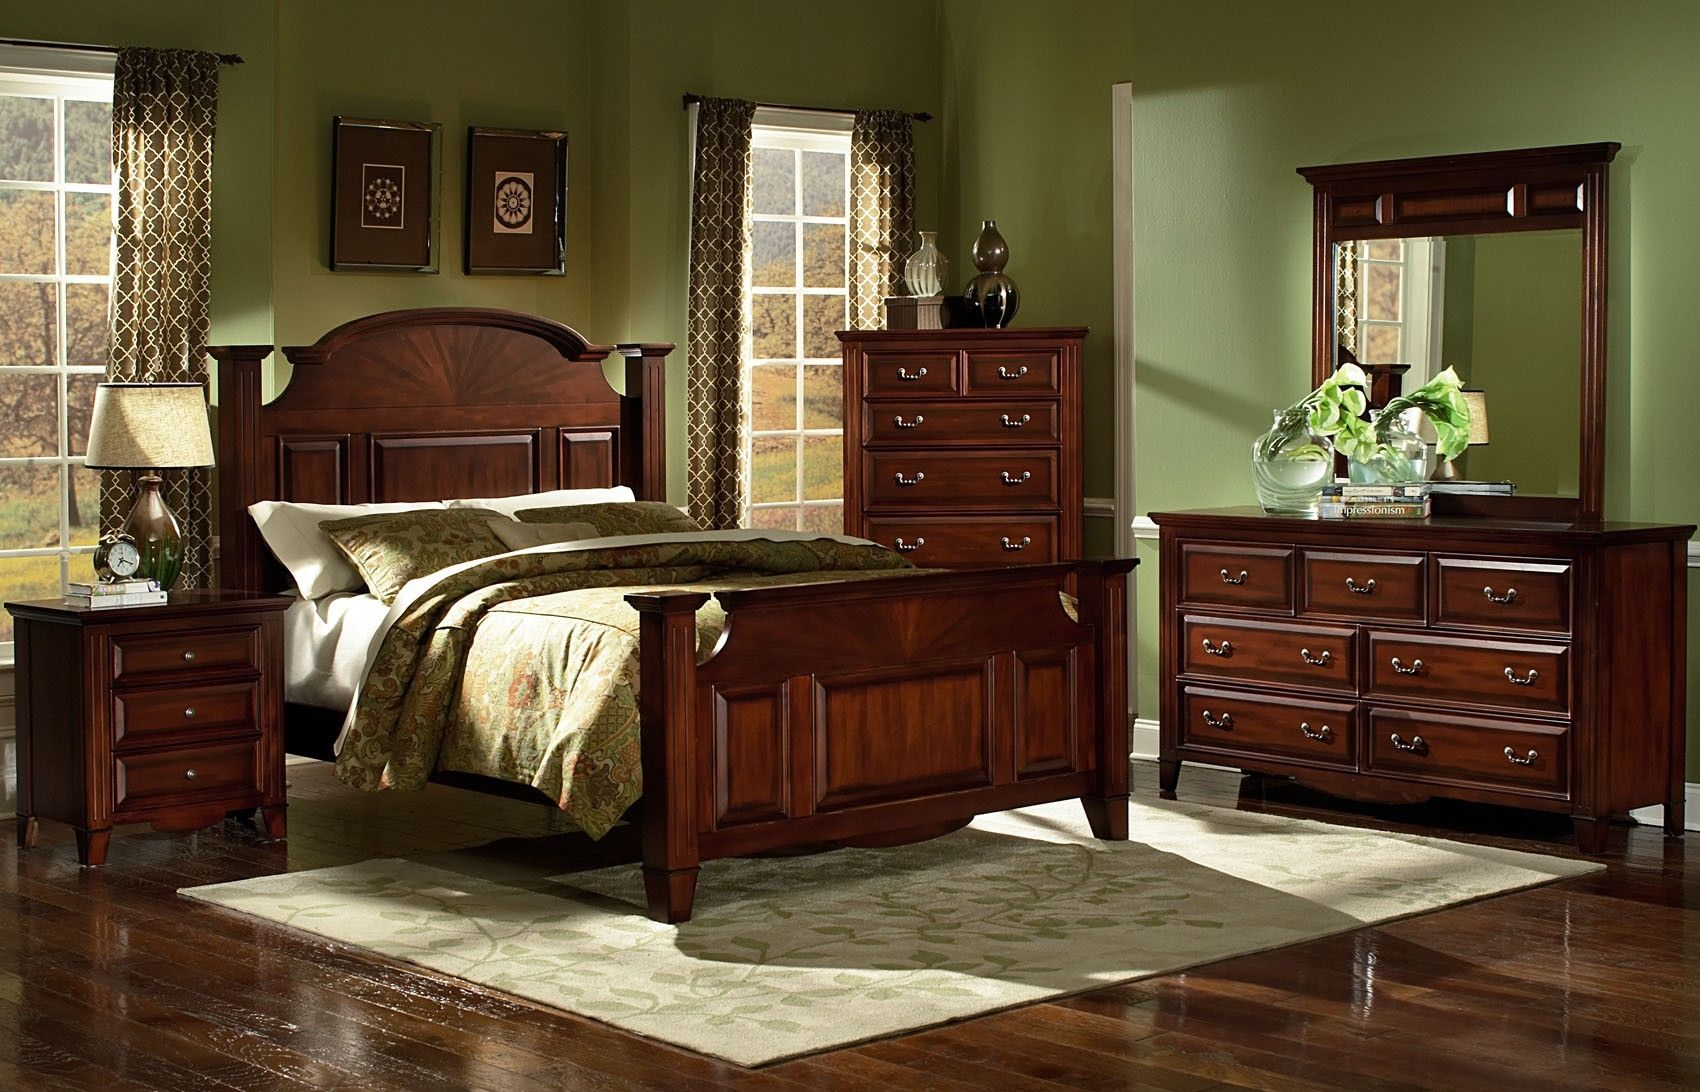 Bedroom Furniture Sets Queen Size  Bedroom Furniture  Pinterest Amusing Queen Size Bedroom Sets Design Inspiration